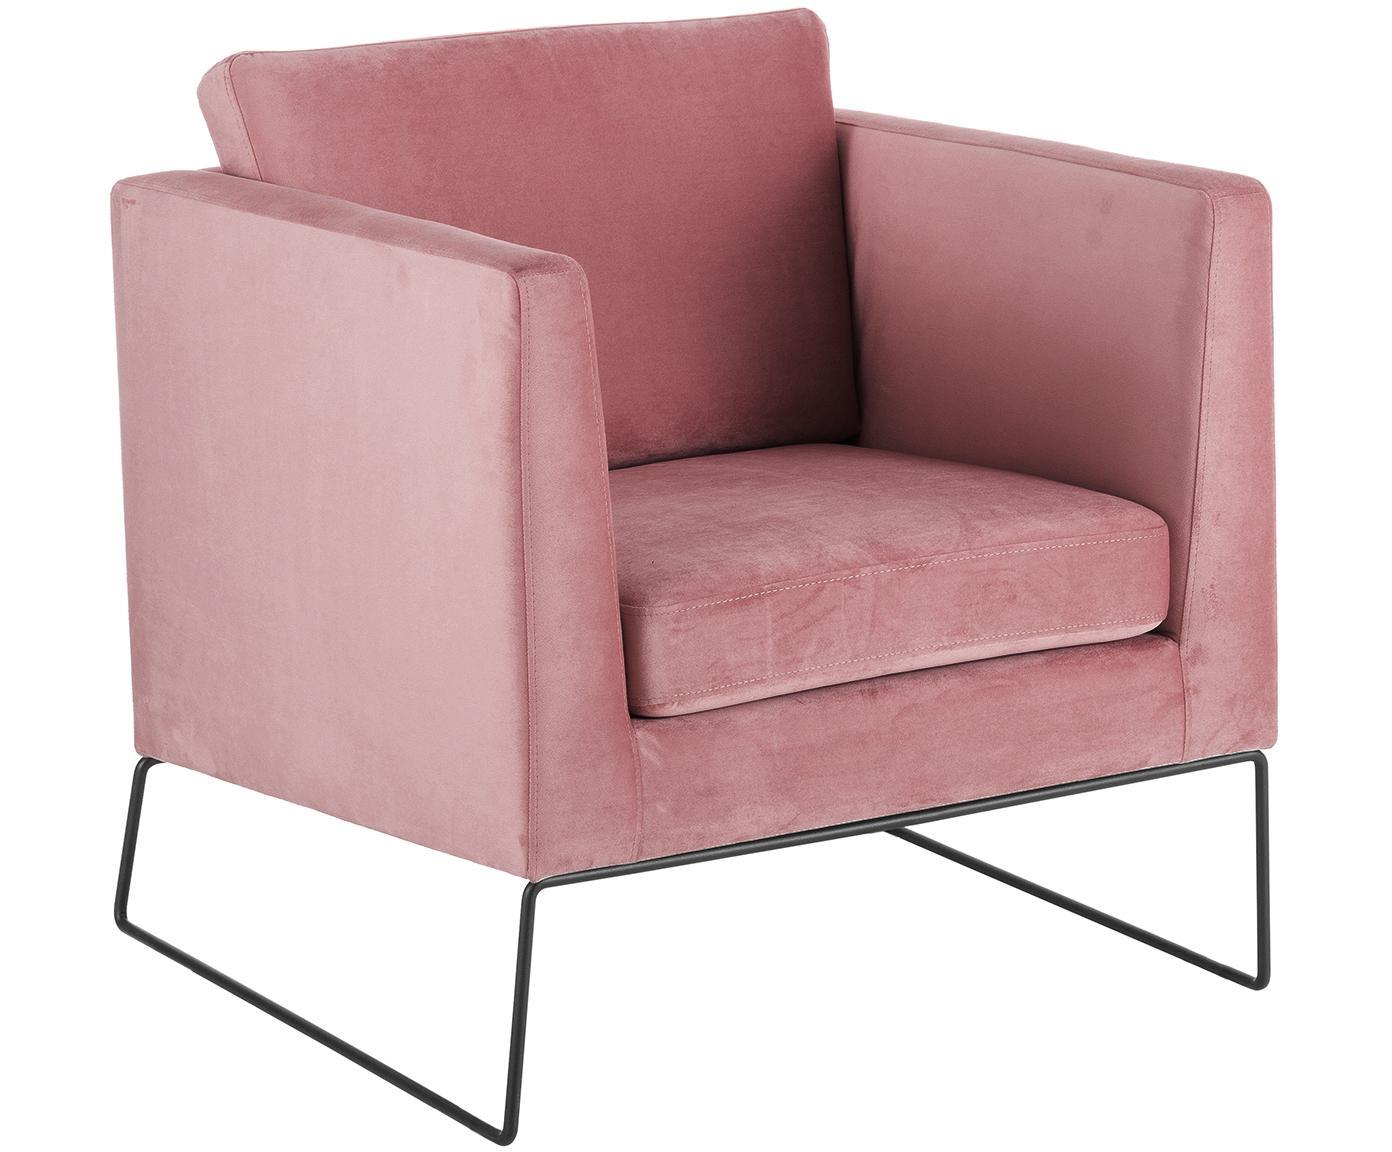 Fluwelen fauteuil Milo, Bekleding: fluweel (hoogwaardig poly, Frame: grenenhout, Poten: gelakt metaal, Roze, 77 x 75 cm